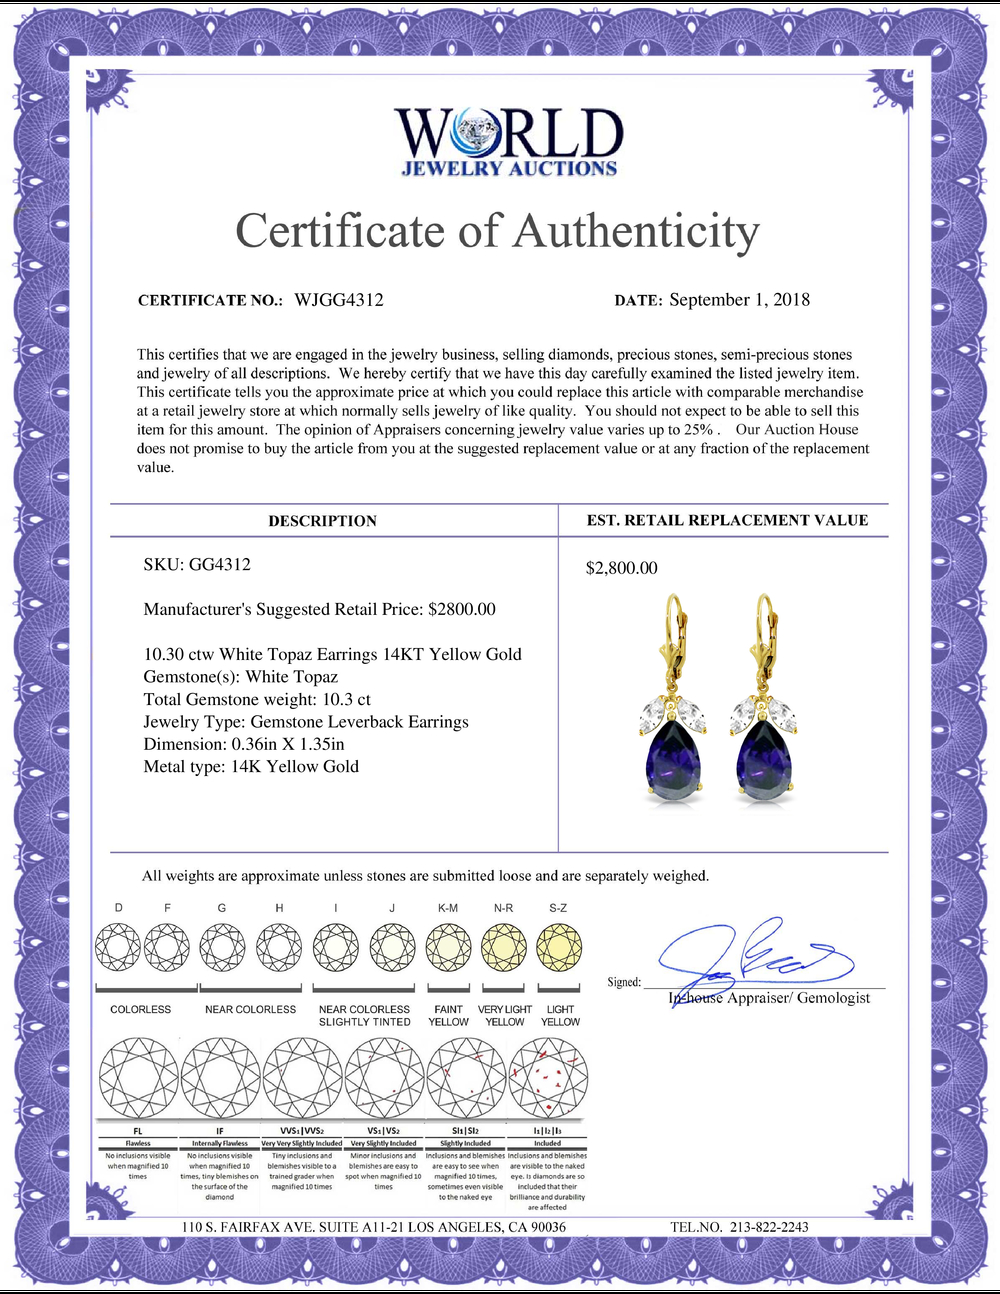 Lot 3099: Genuine 10.30 ctw White Topaz Earrings Jewelry 14KT Yellow Gold - REF-92A6K